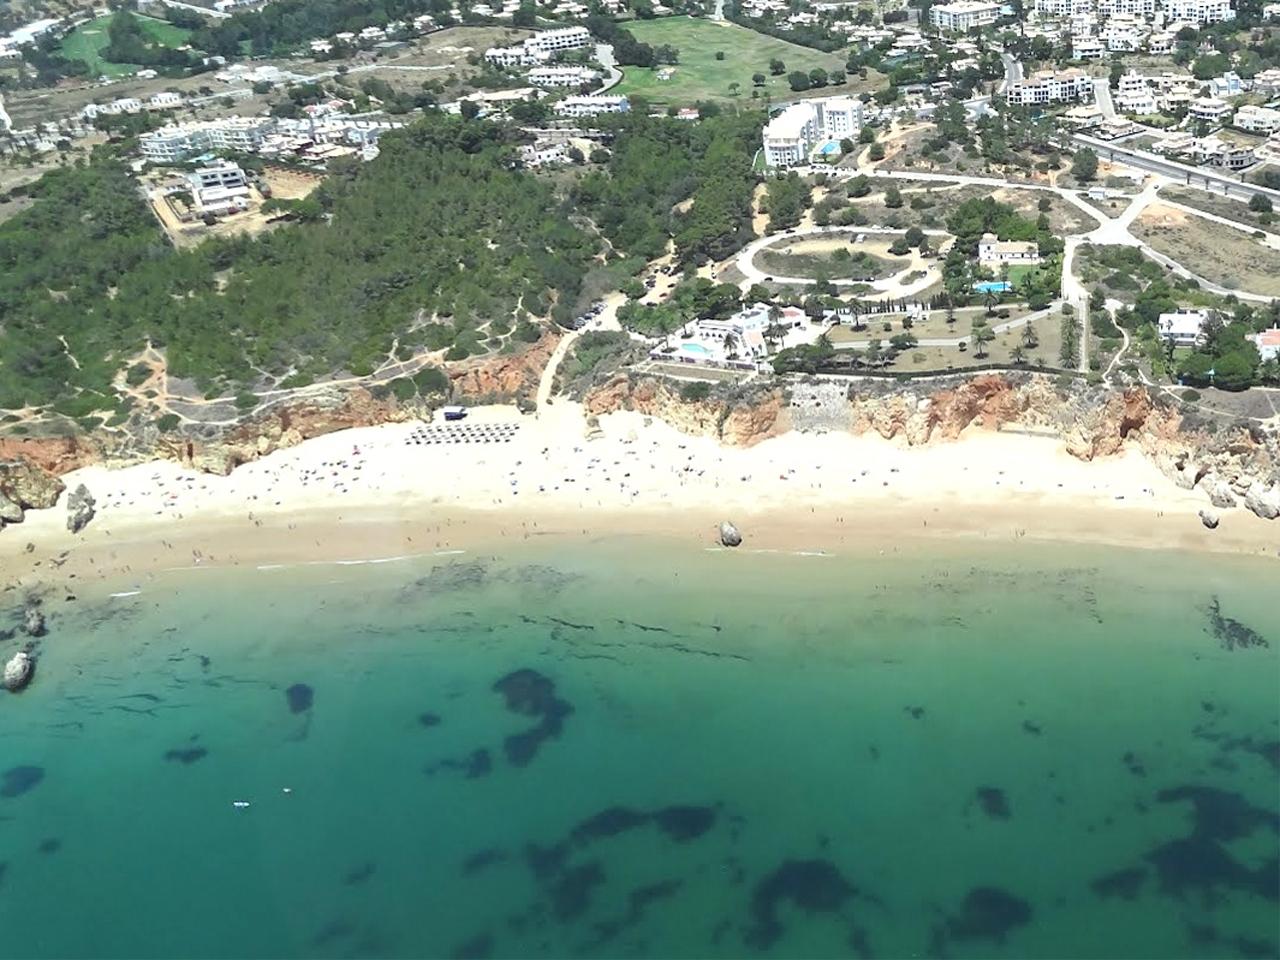 mapa praia do vau Praia do Vau   Mapa   Algarve Portal mapa praia do vau